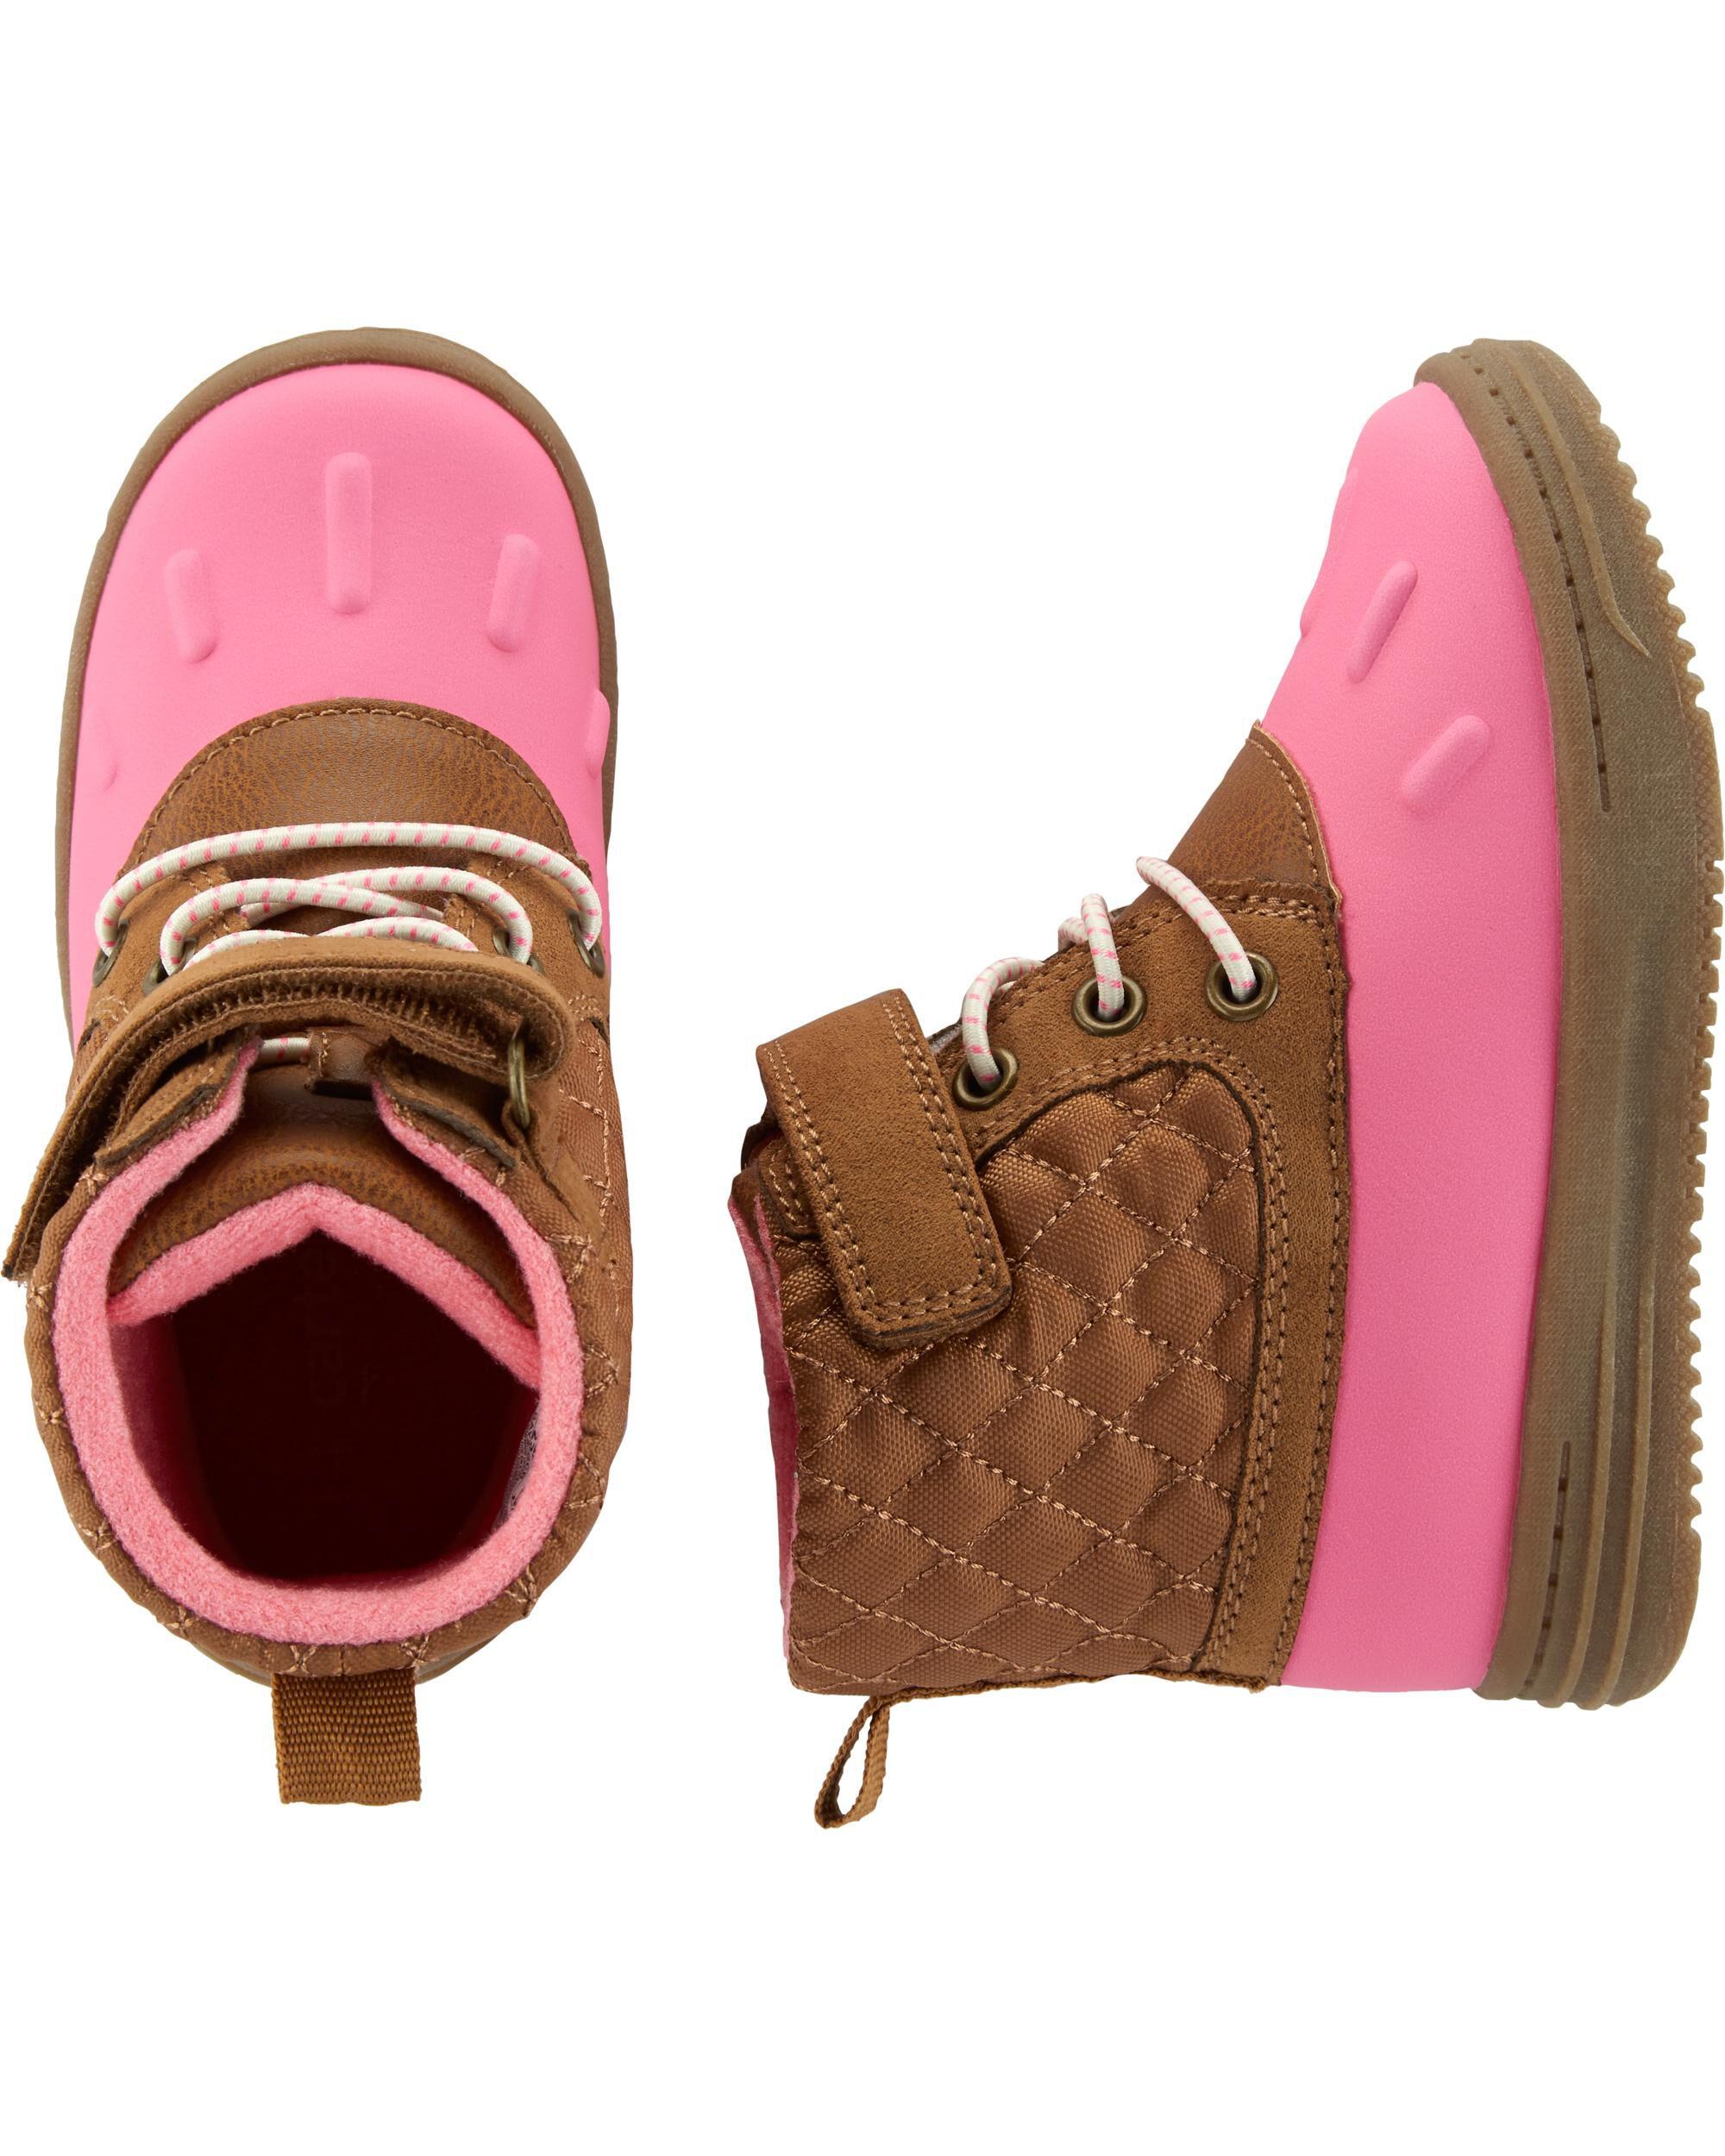 Carter's Duck Boots | oshkosh.com